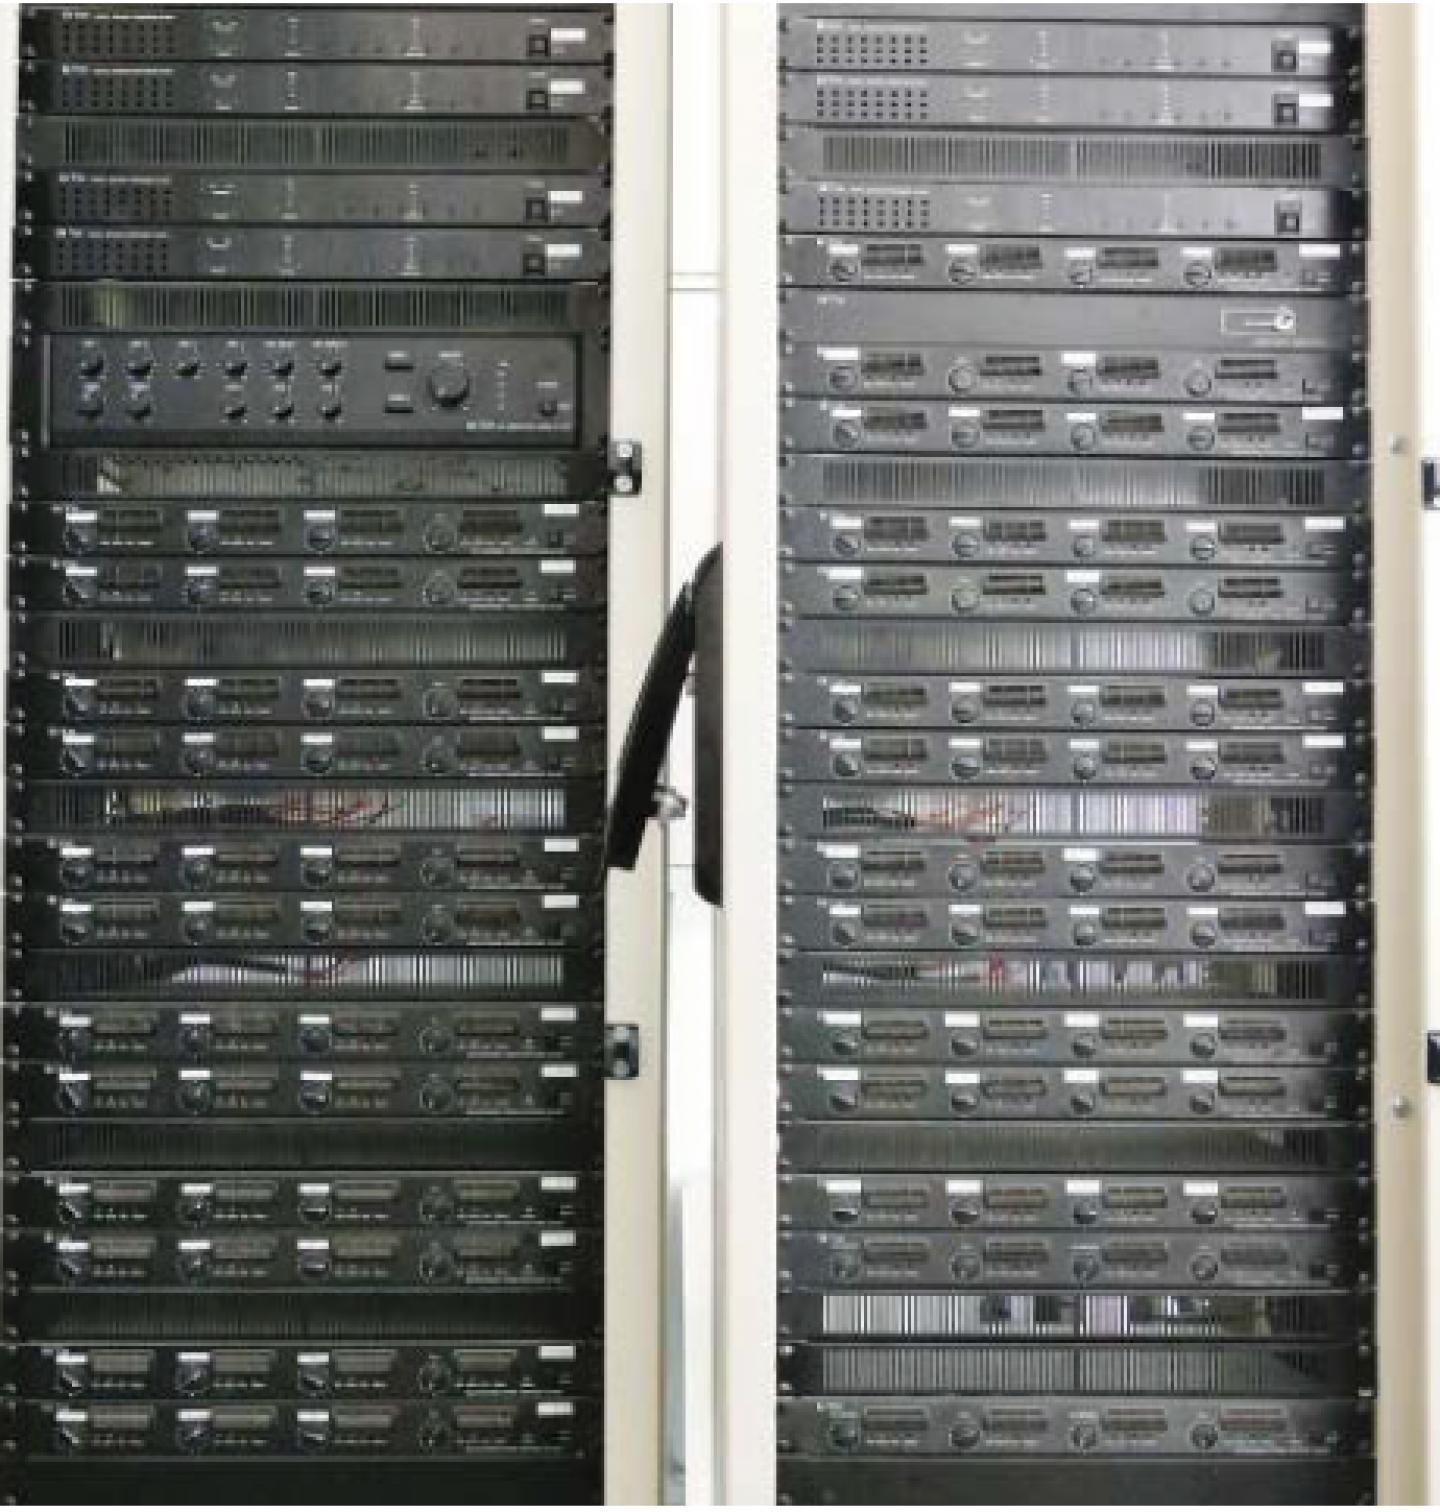 27 TOA DA-250F amplifiers in use